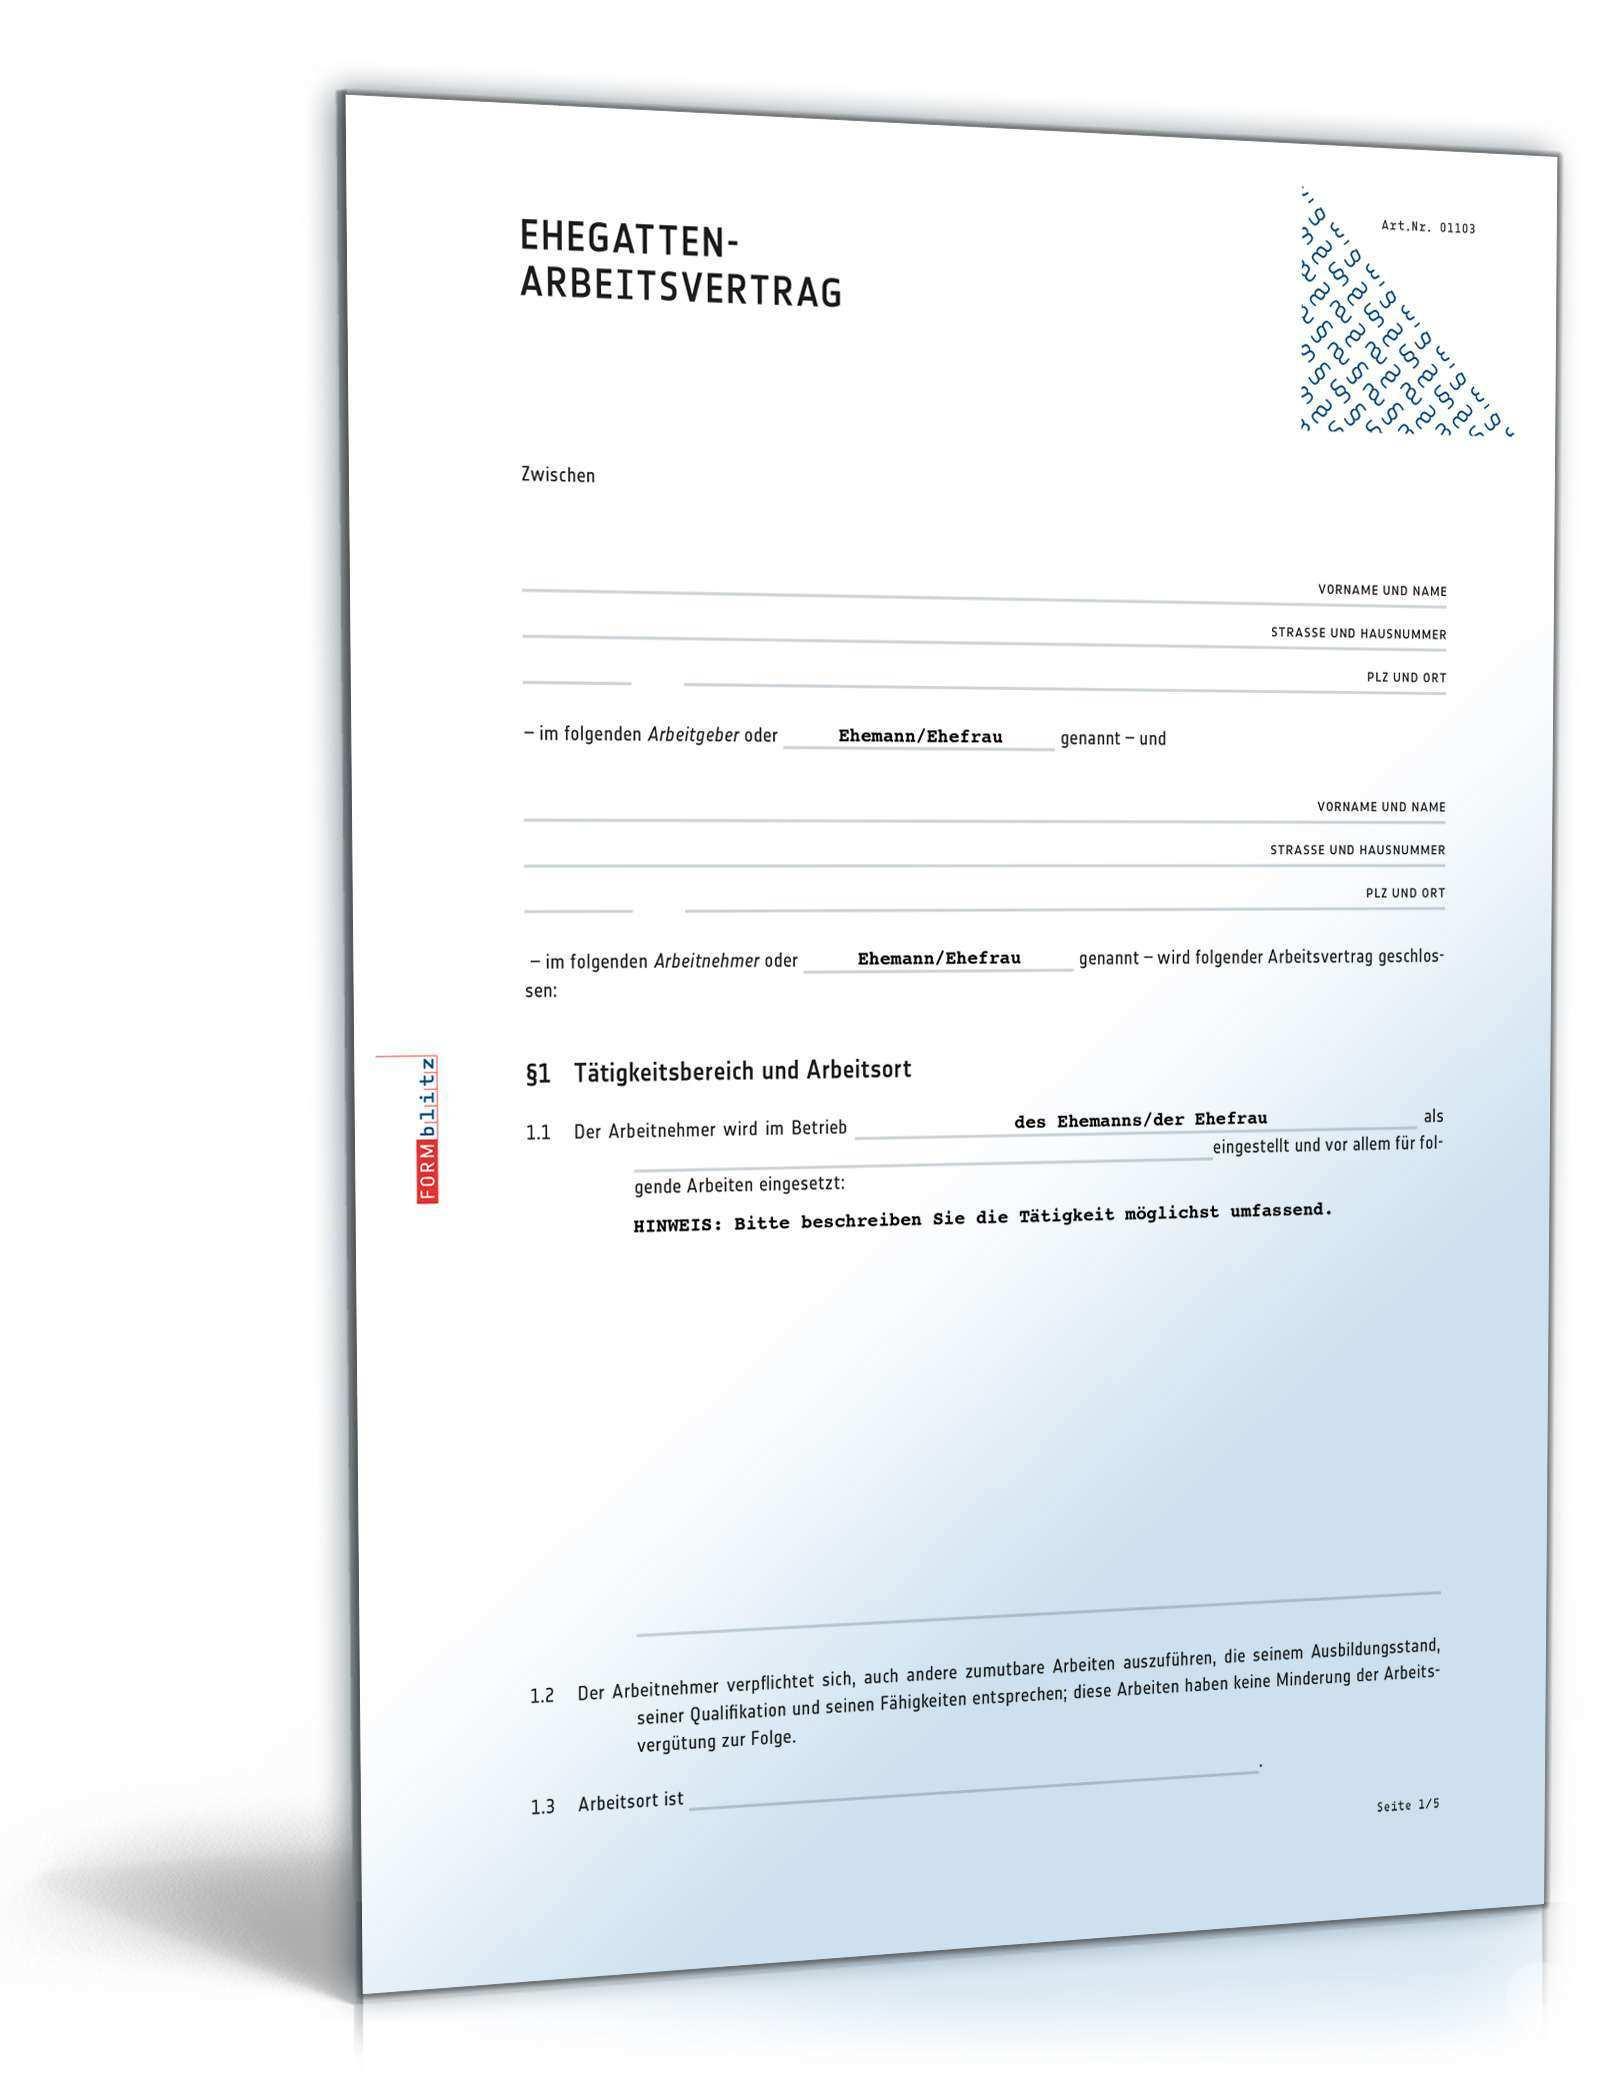 Ehegatten Arbeitsvertrag Anwaltsgepruftes Muster Zum Download